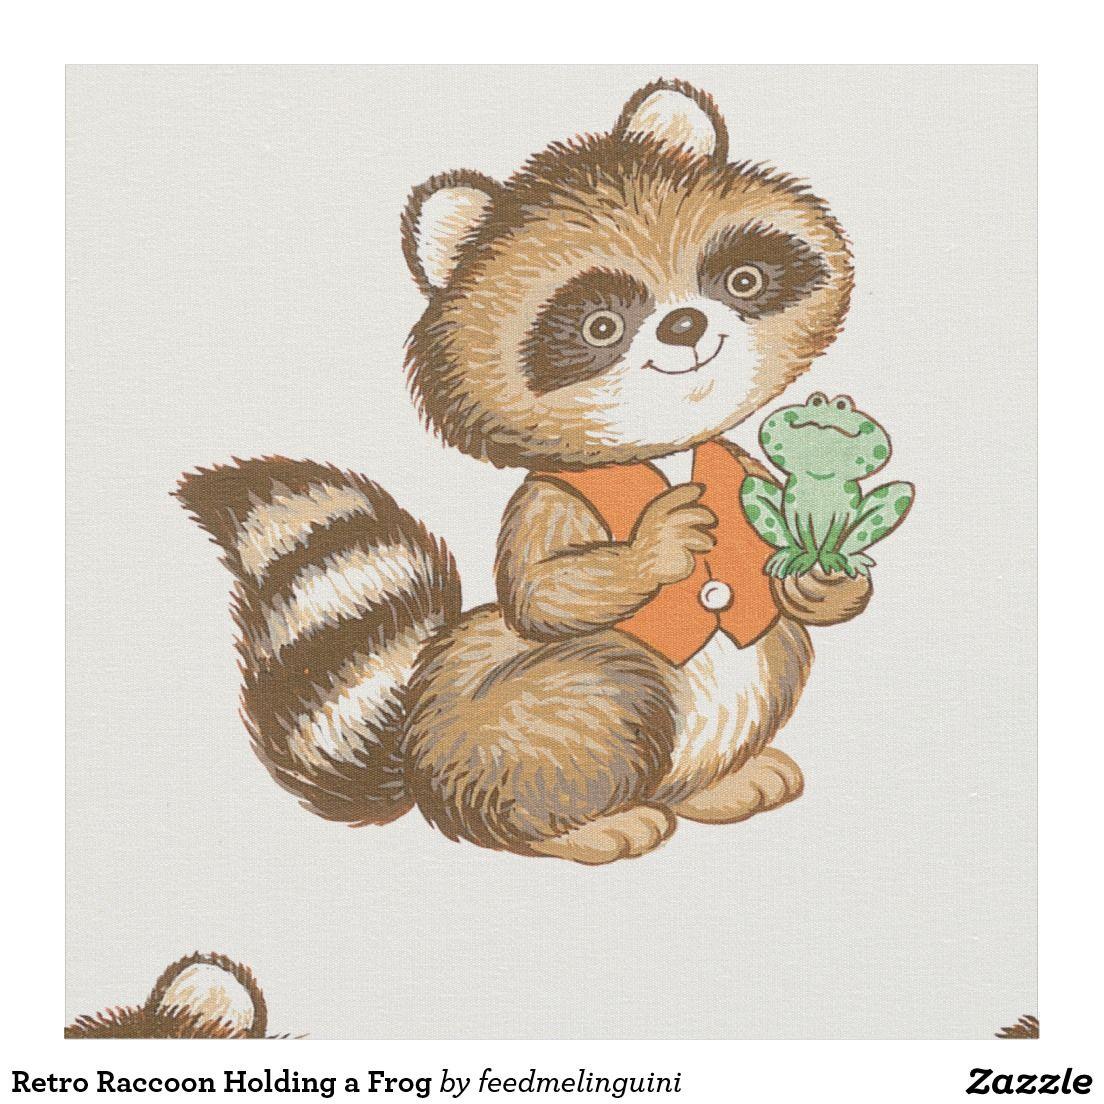 Baby Raccoon By Deikochan On Deviantart Raccoon Drawing Baby Raccoon Pencil Drawings Of Animals